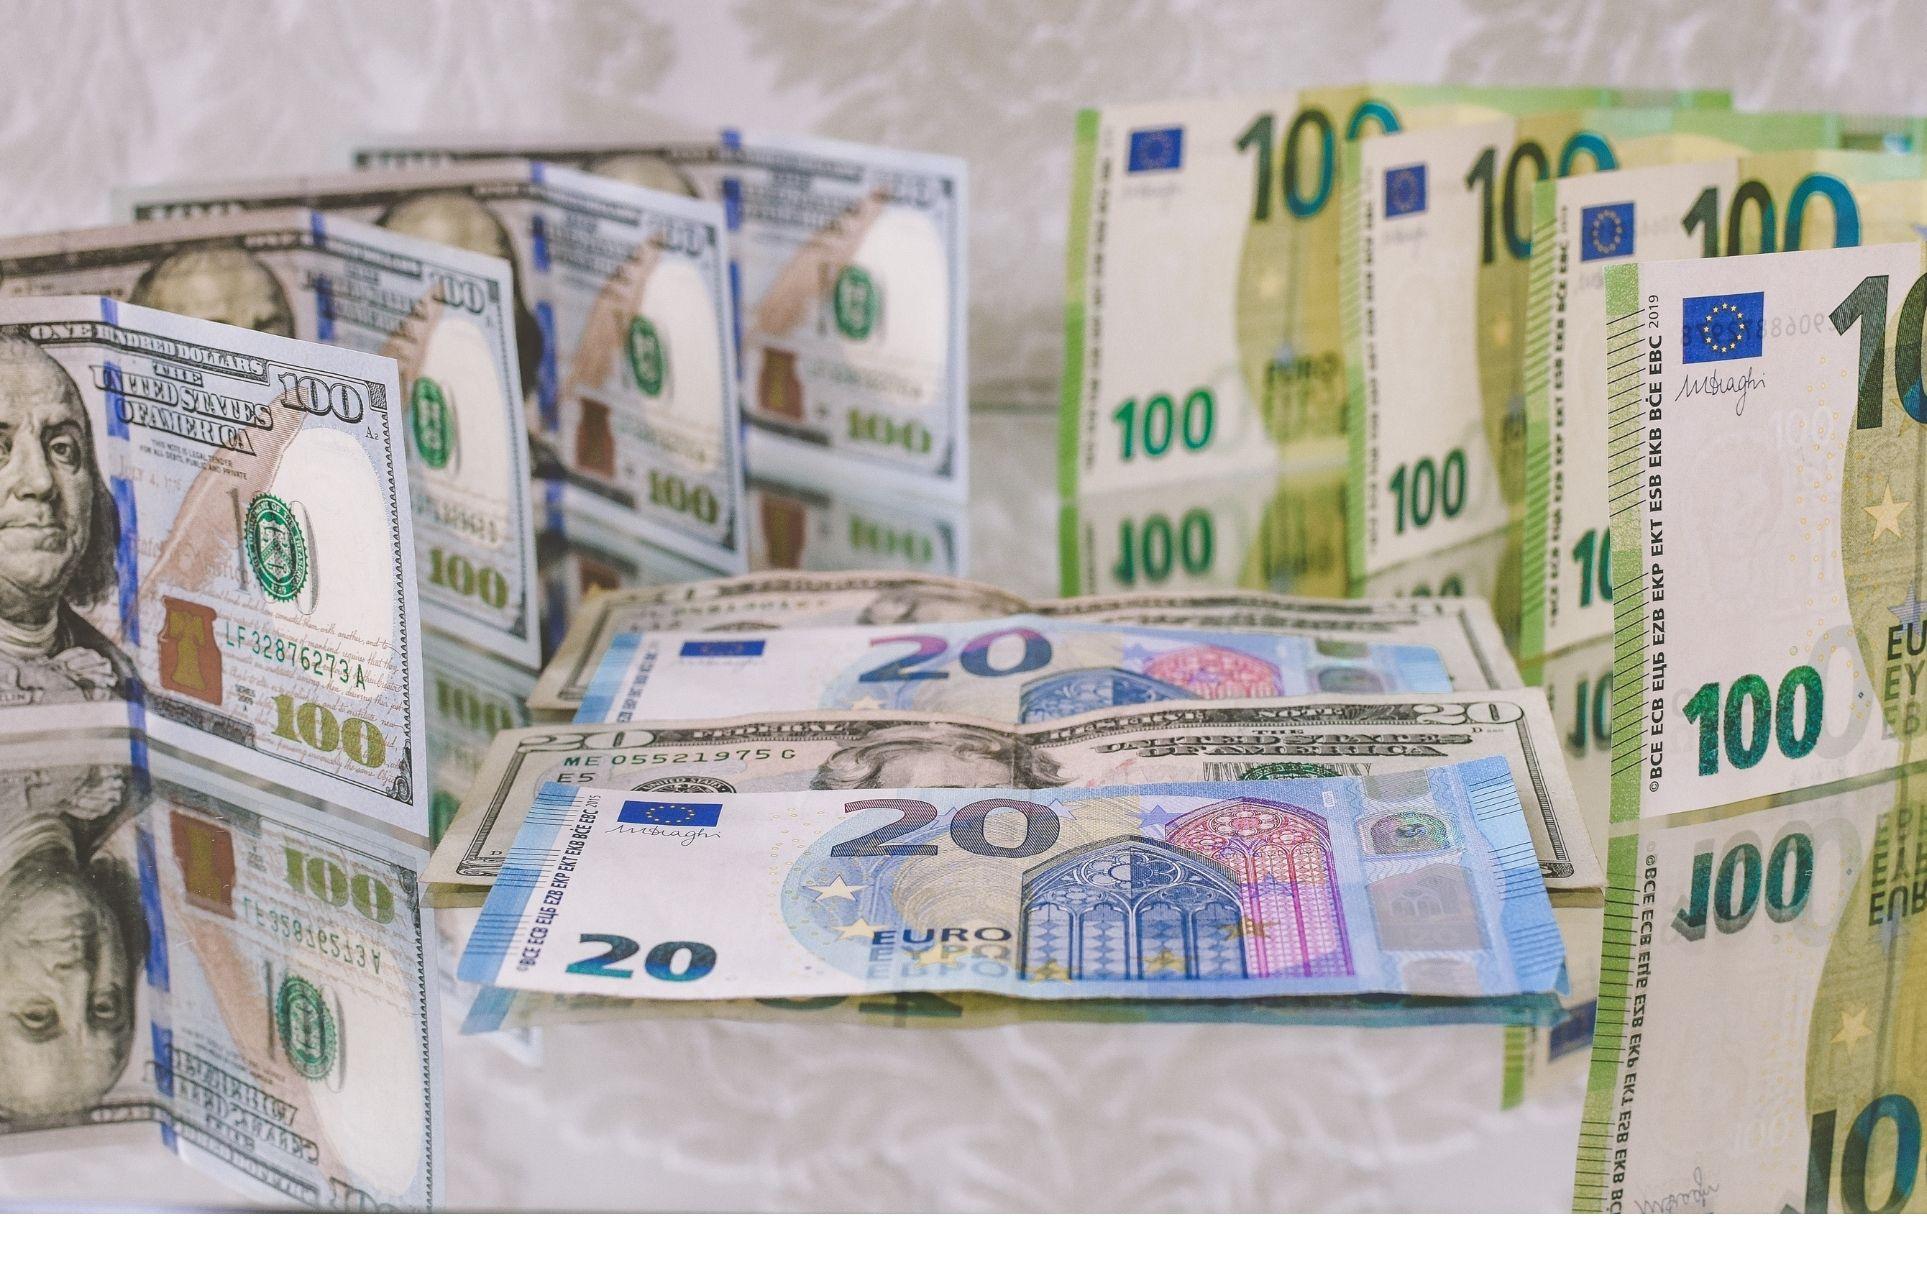 Reclama tu microcrédito Ibercrédito y Recupera tu dinero YA